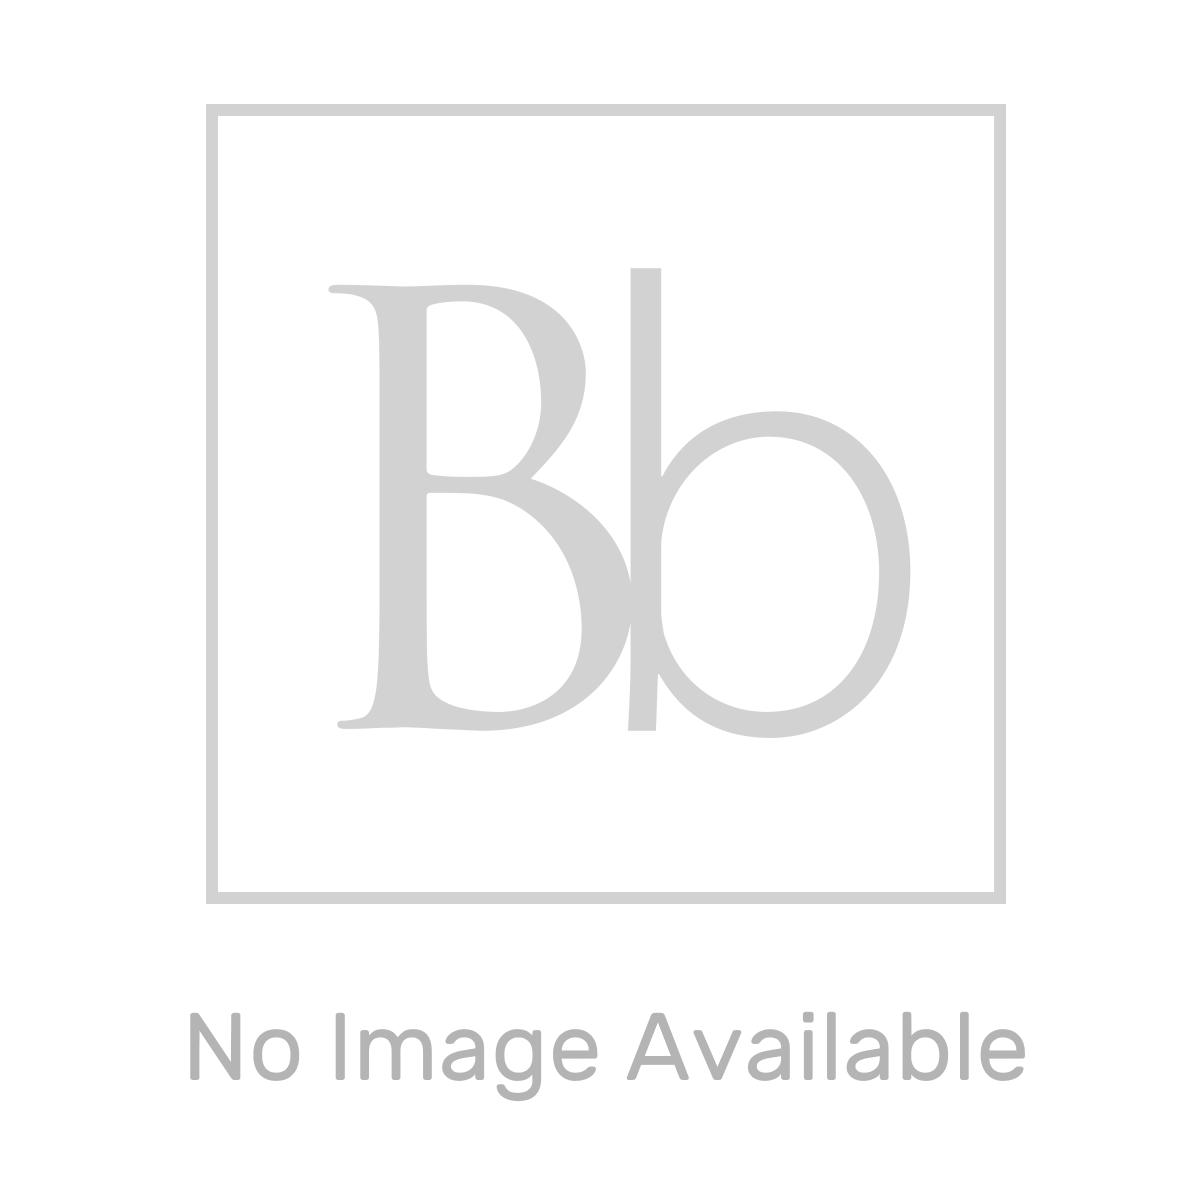 Croydex Ivory Phthalate Free PVC Shower Curtain